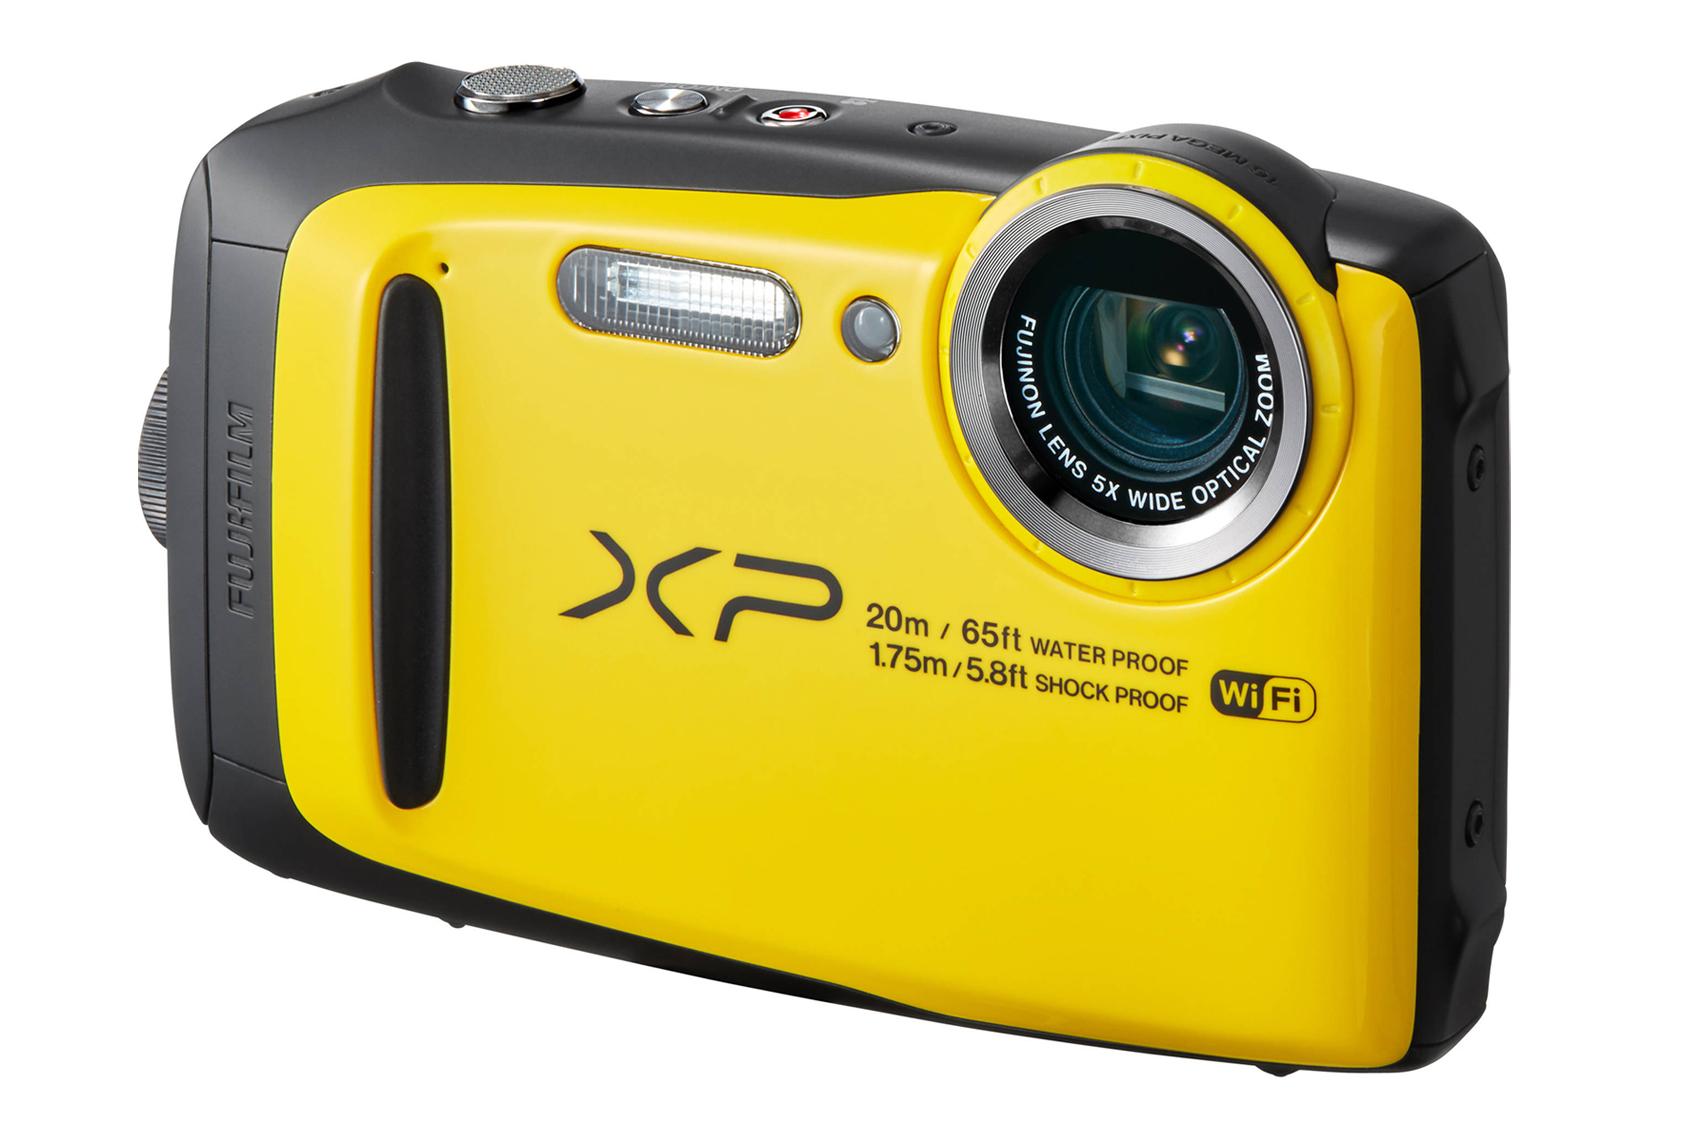 Top compact travel cameras fujifilm_16544125_finepix_xp120_digital_camera_1311266